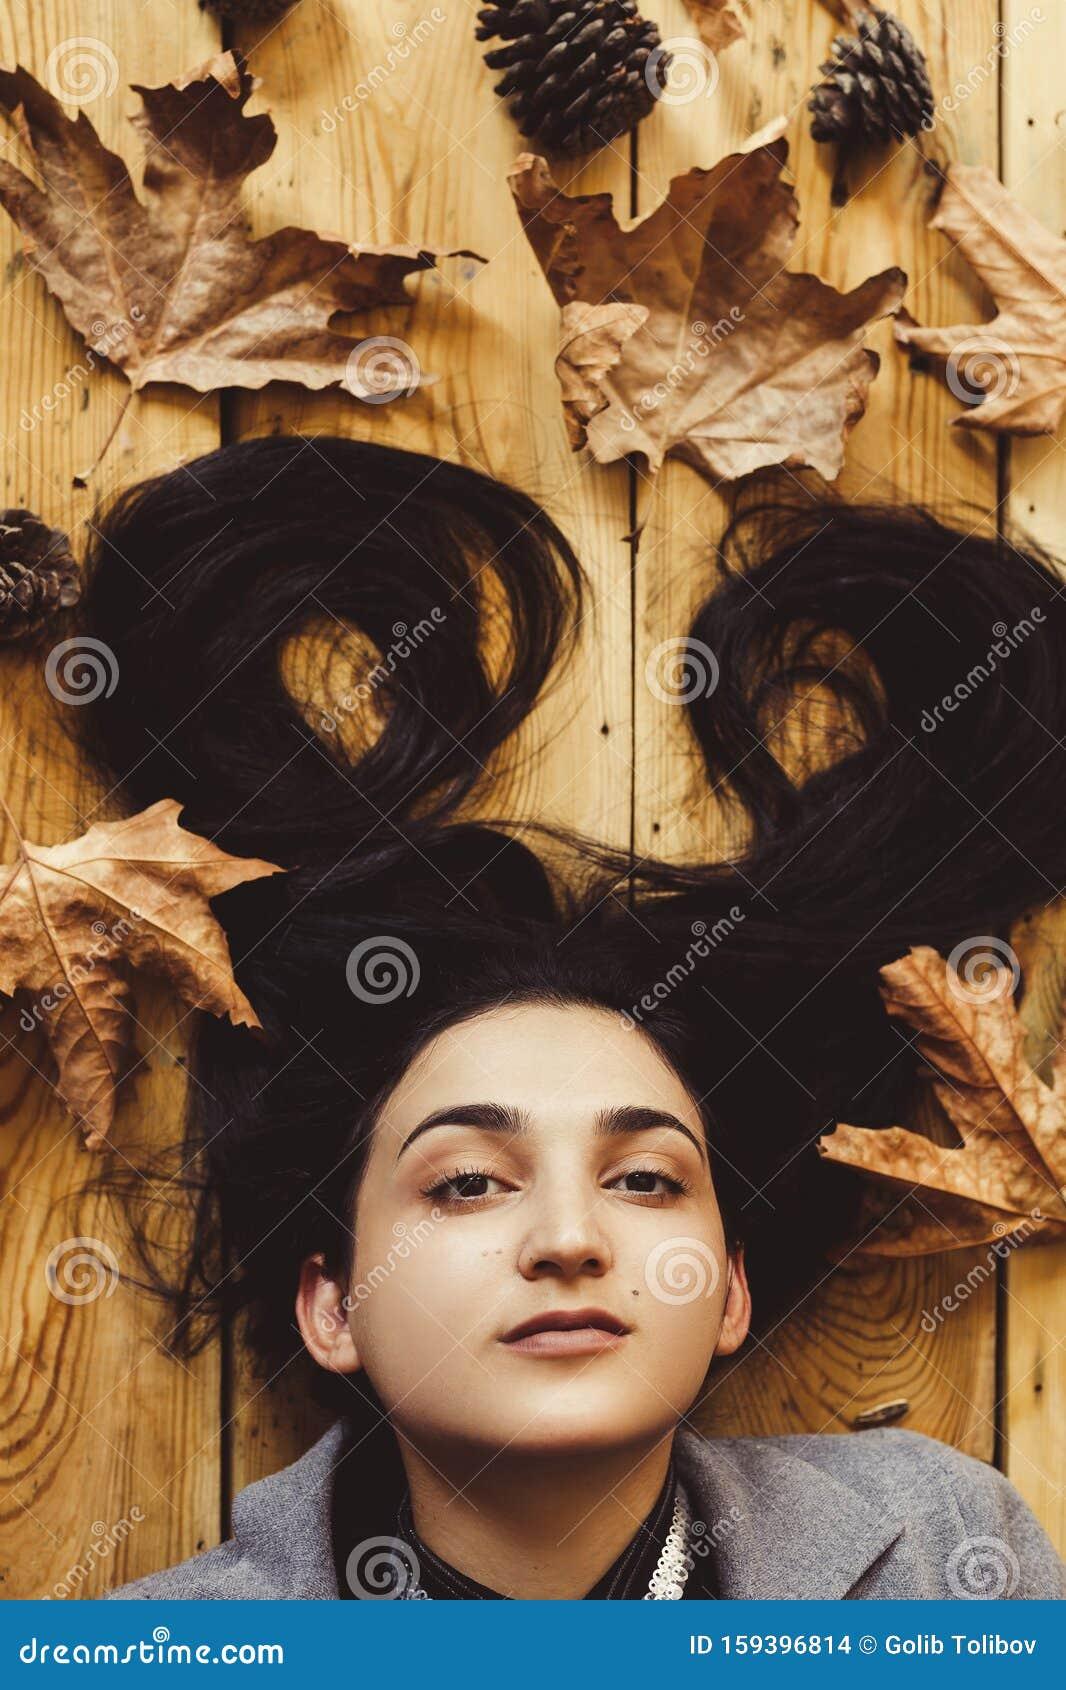 Autumn Woman. Fall Season Concept. A Portrait Of Lying On ...